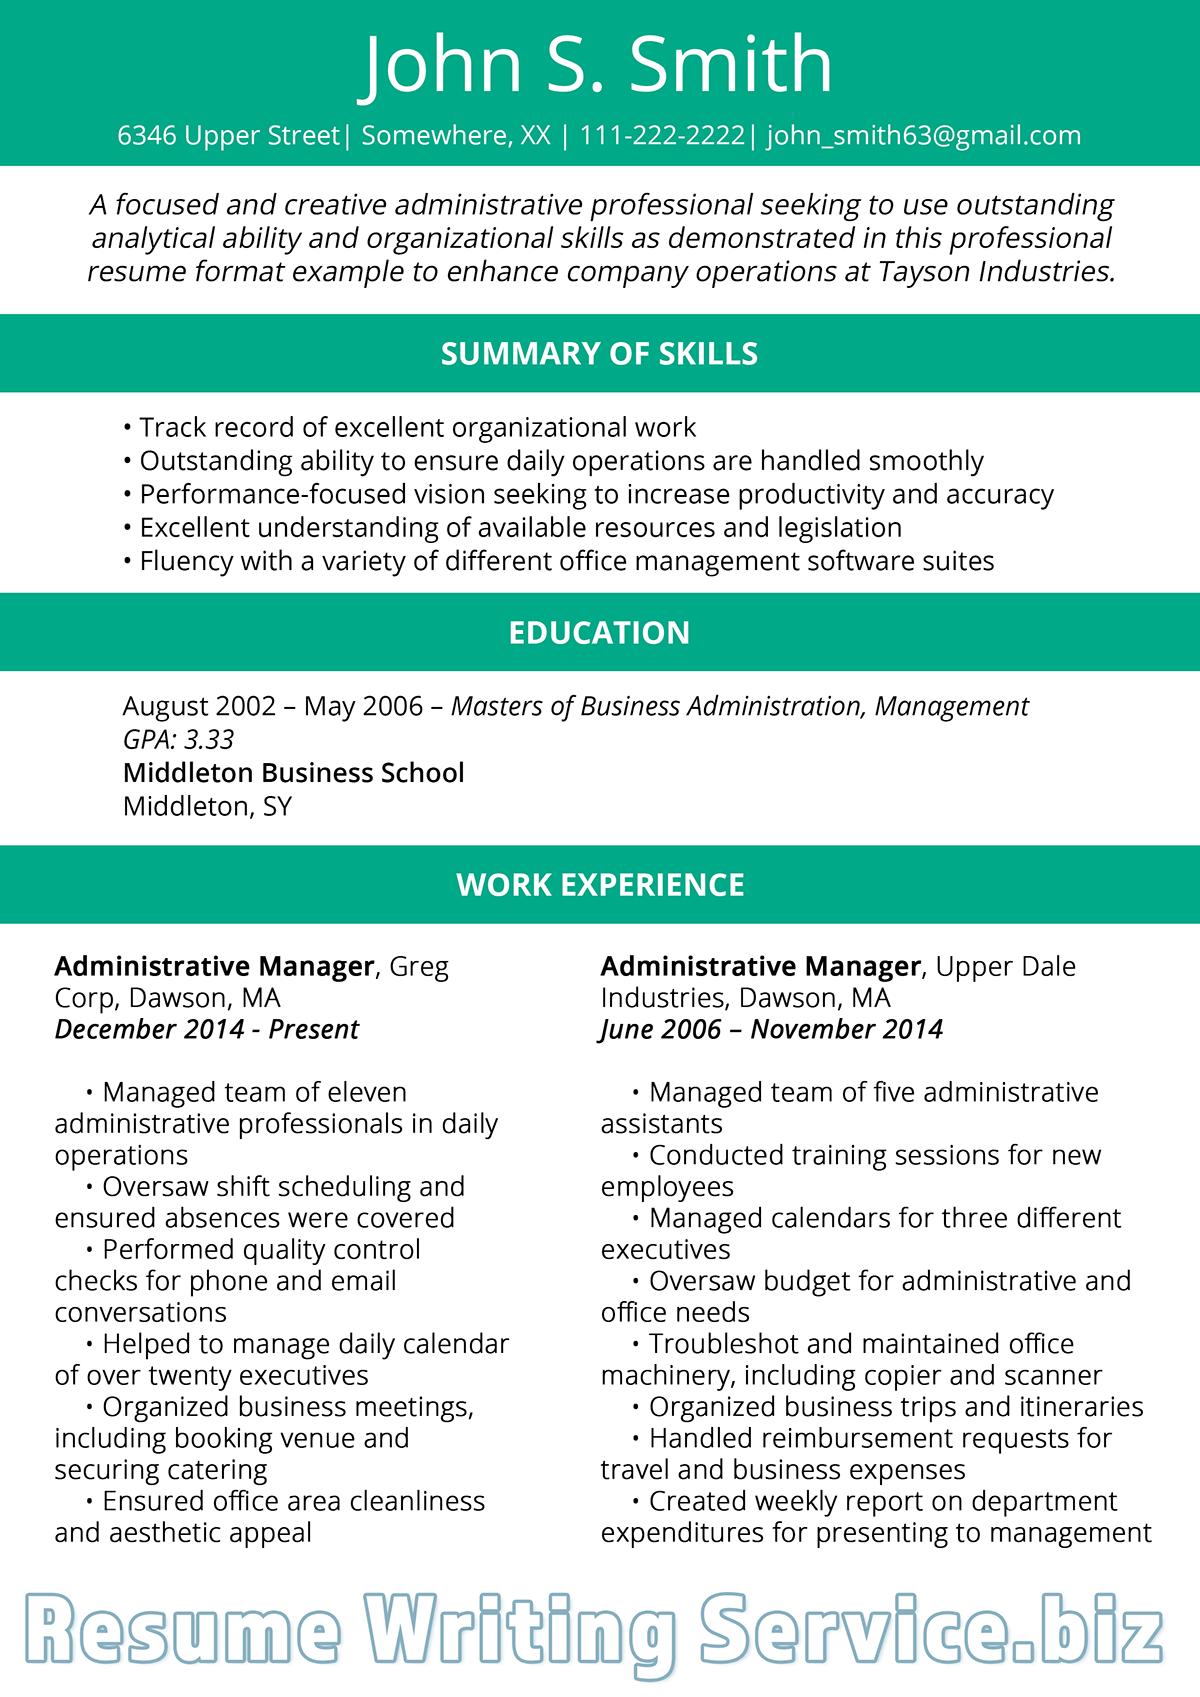 how should a resume look like